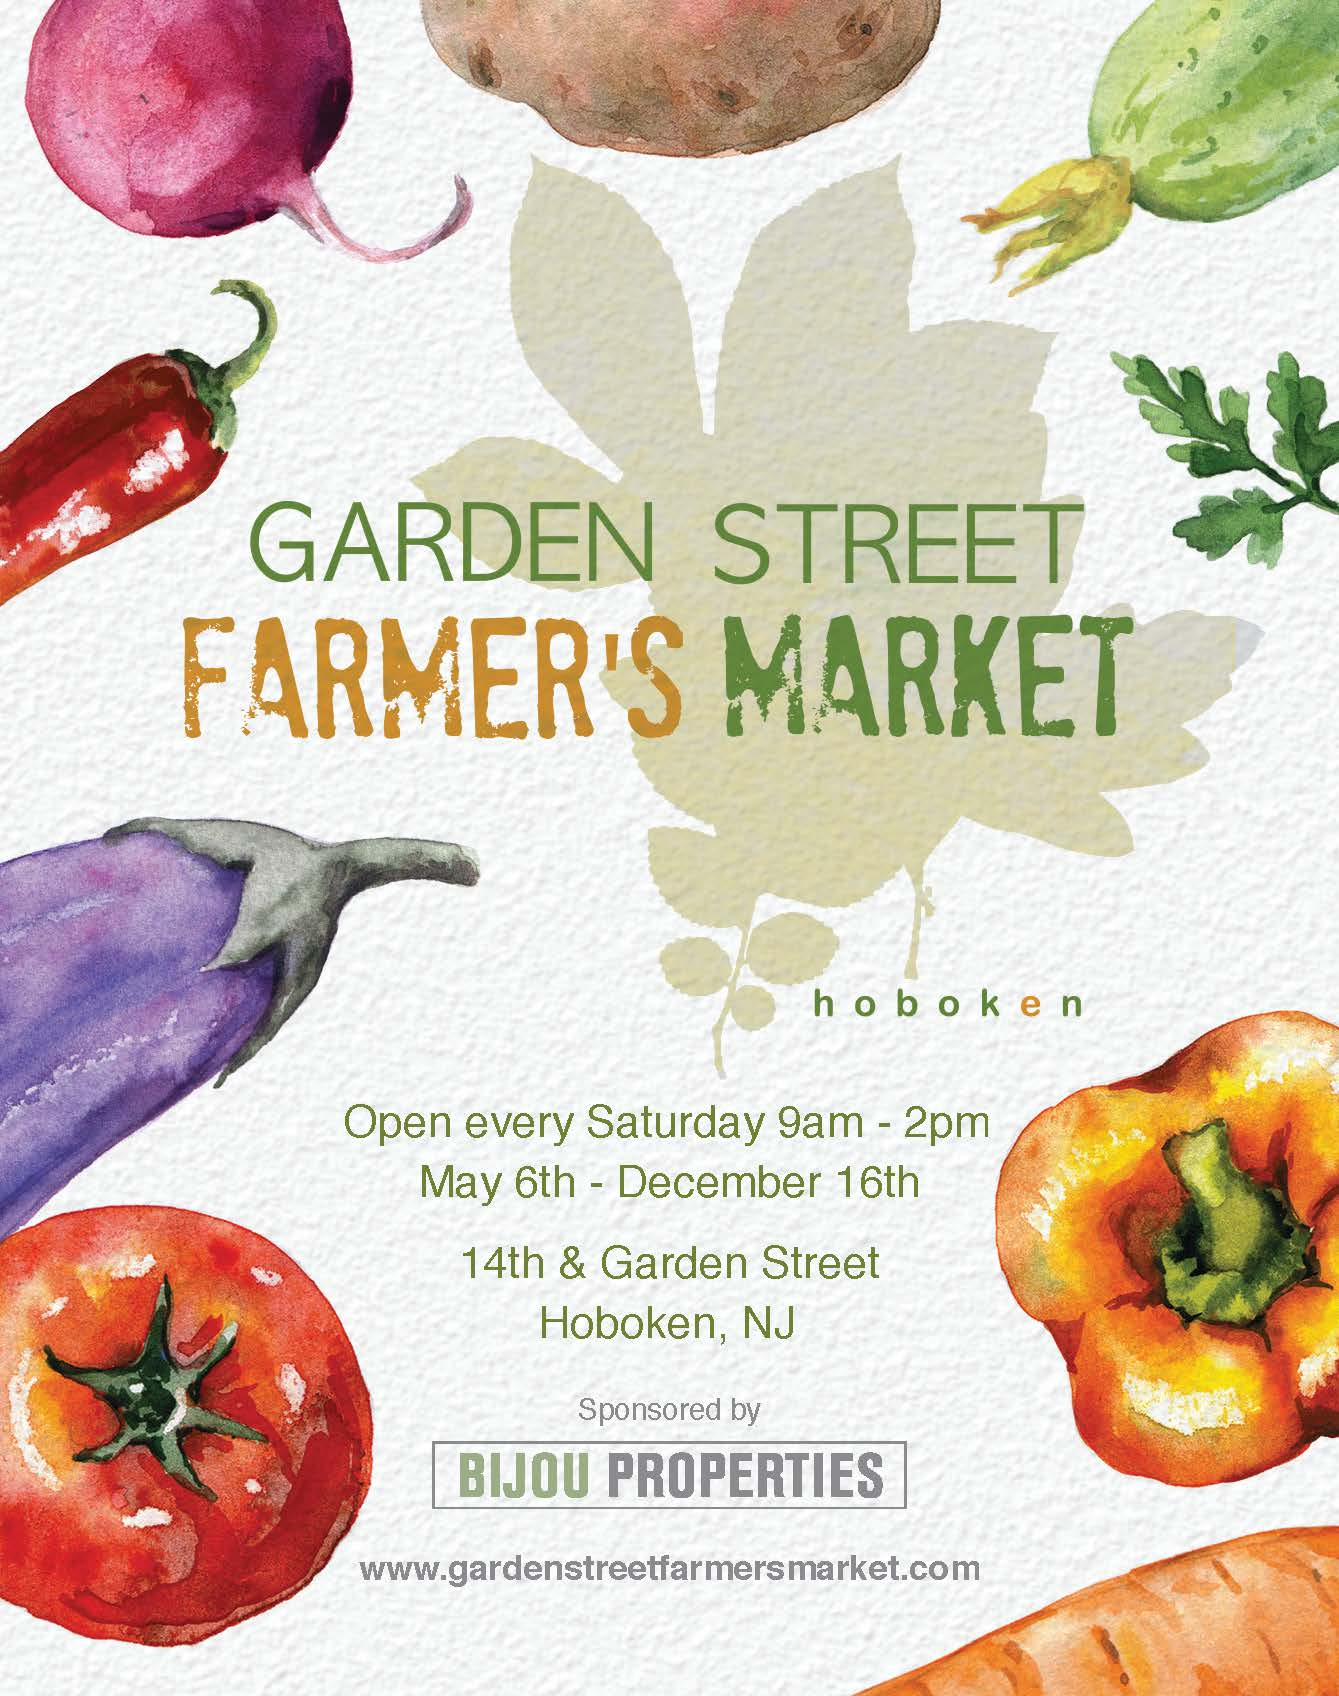 Garden-Street-Farmers-Market-Qrtrpg.jpg